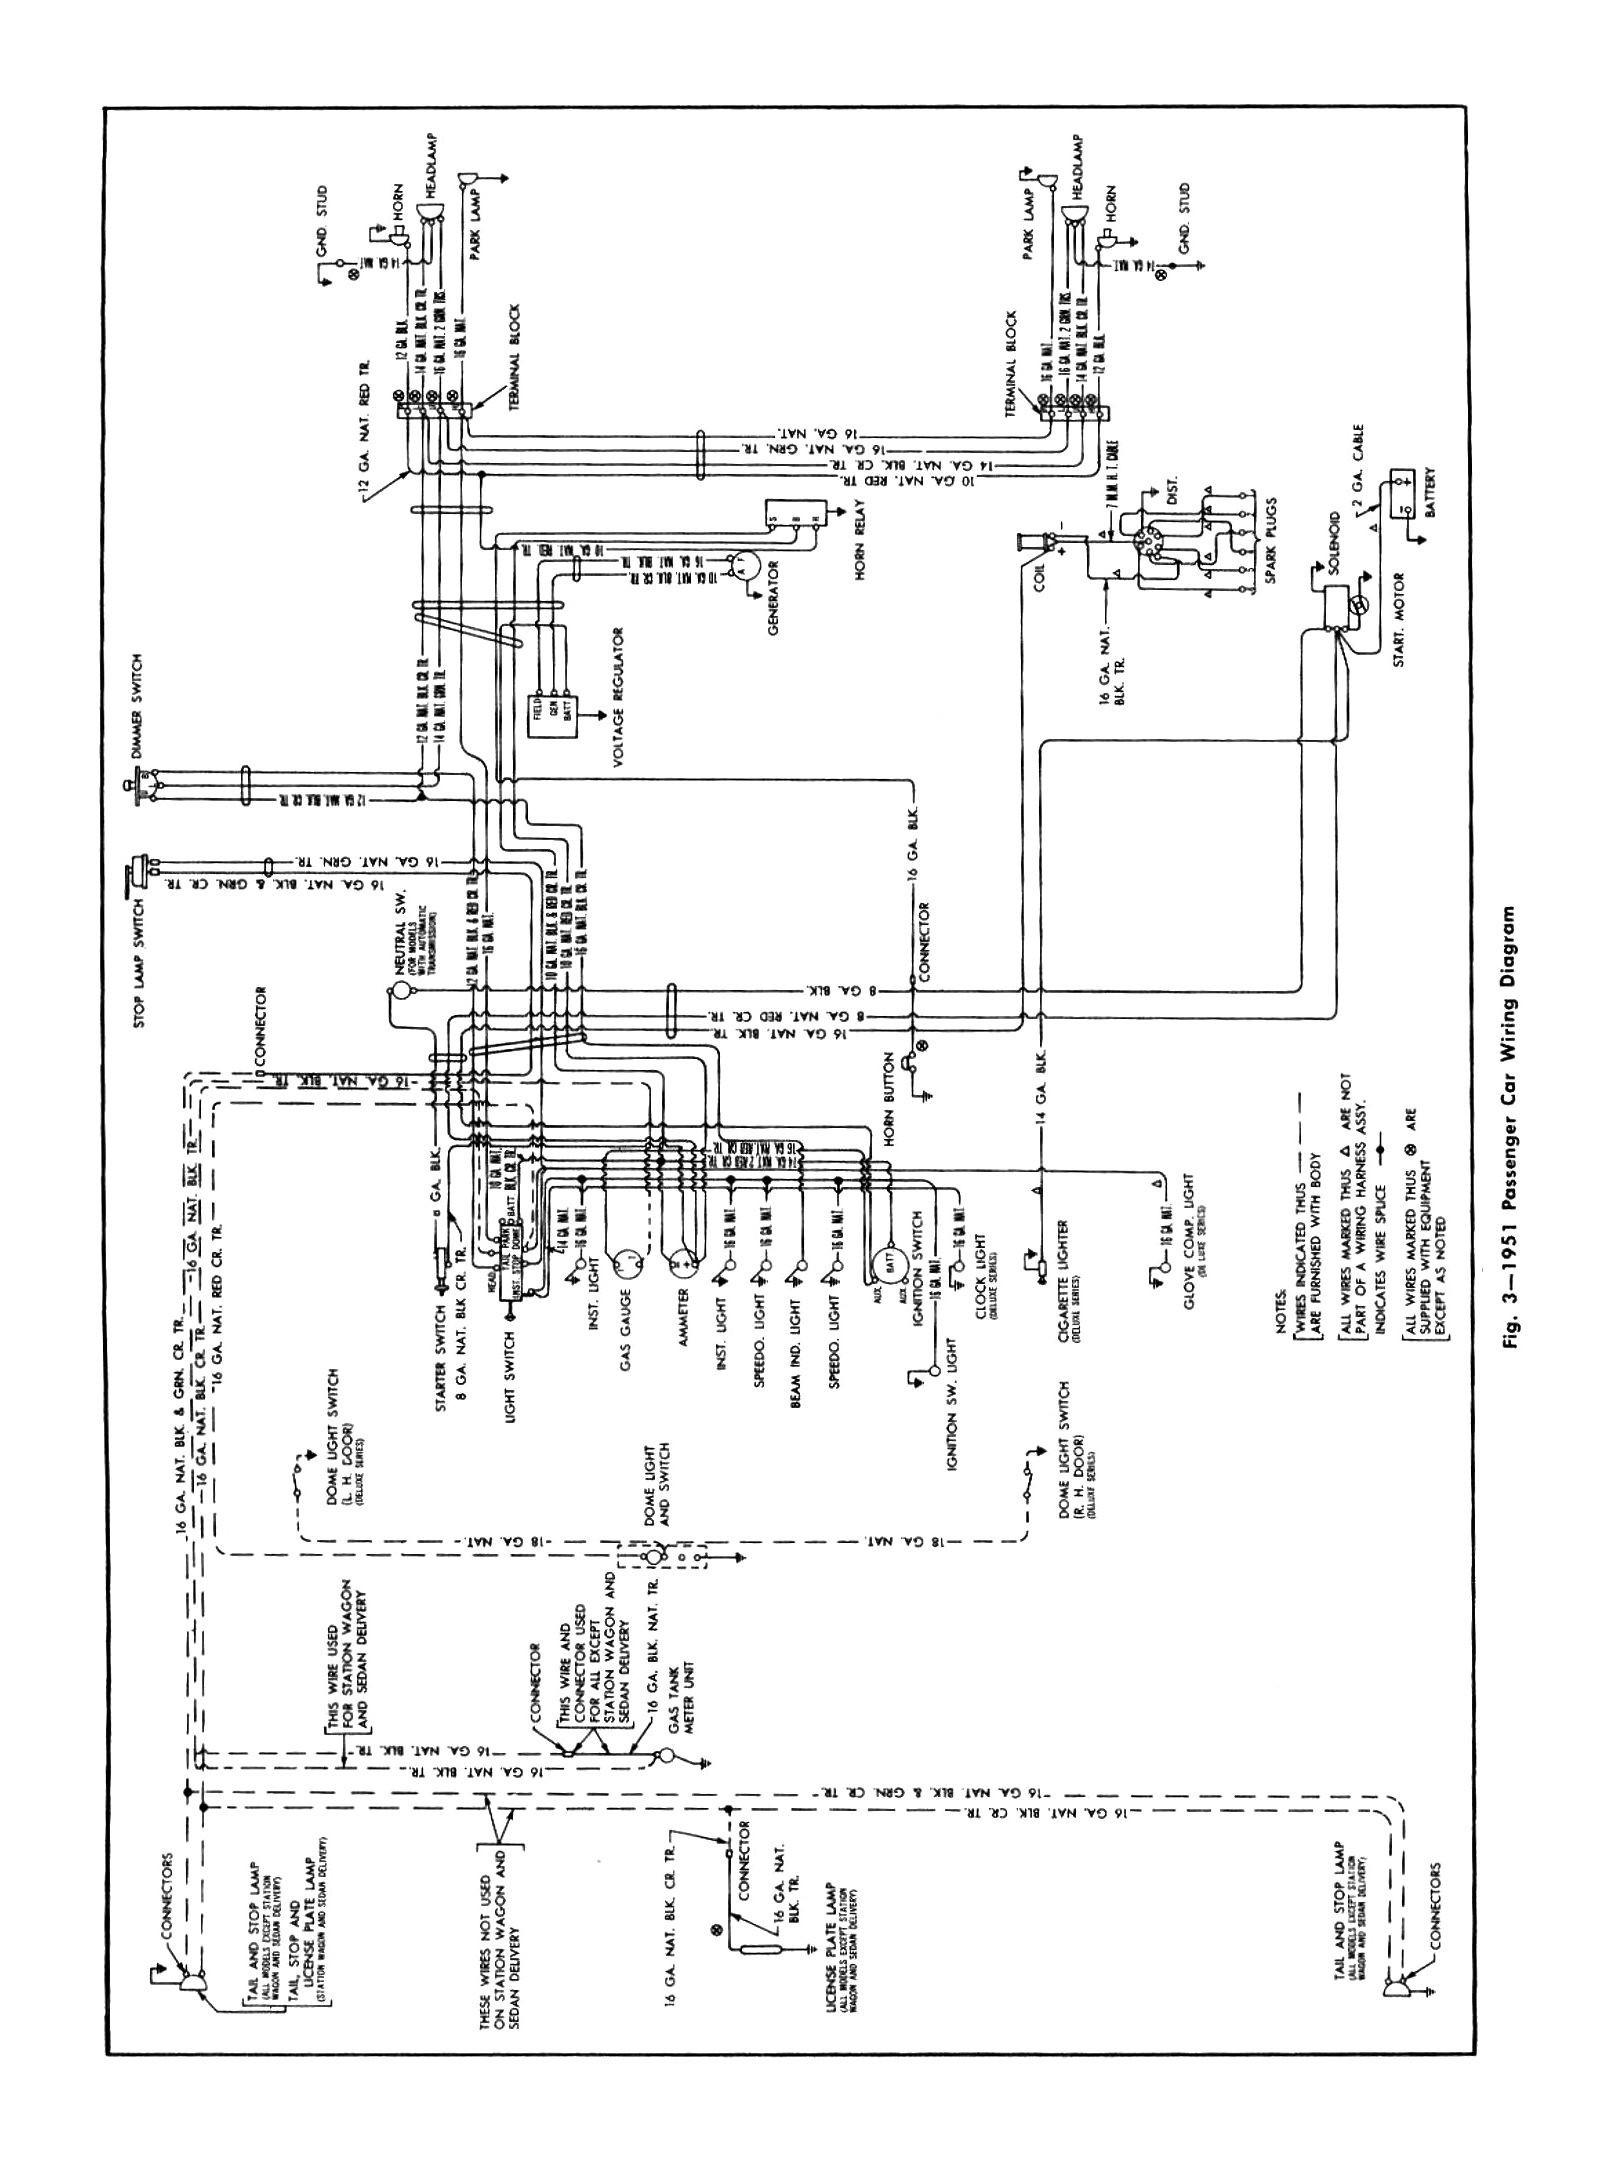 Wiring Diagram 1990 Club Car Golf Cart Fresh Wiring Diagram for 1949 ford Carbon Phase Diagram